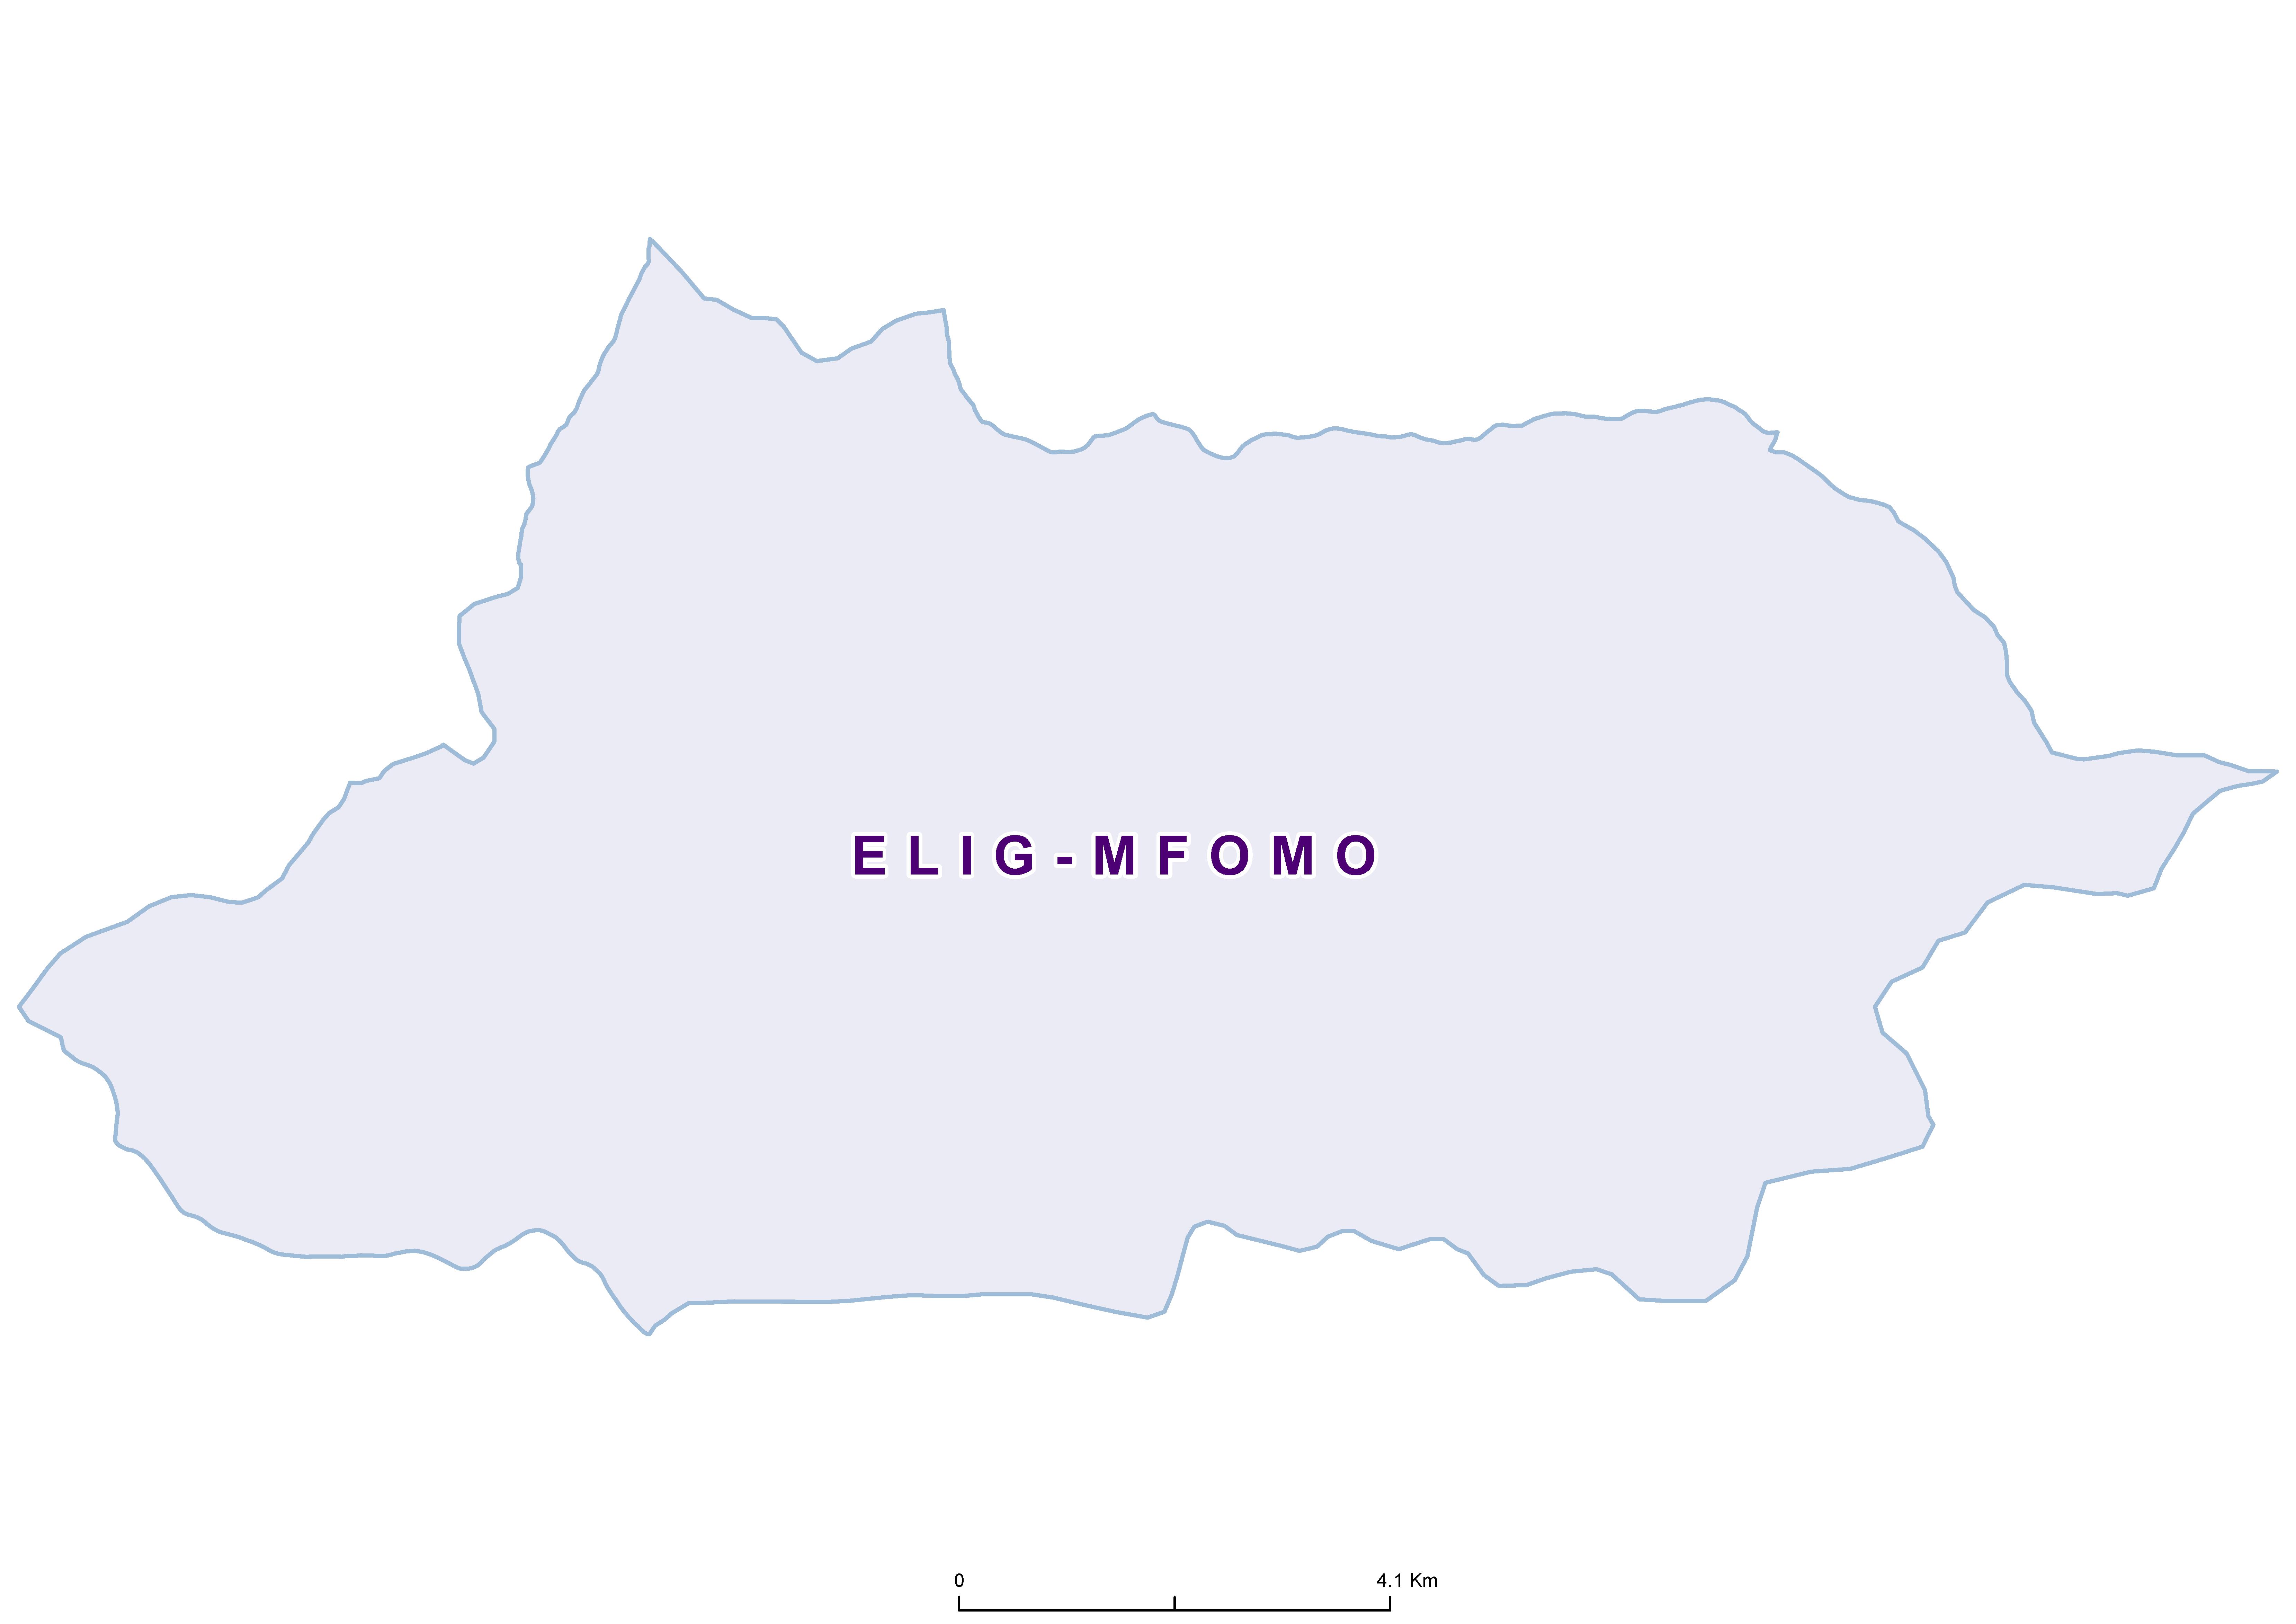 Elig-mfomo Max SCH 20180001